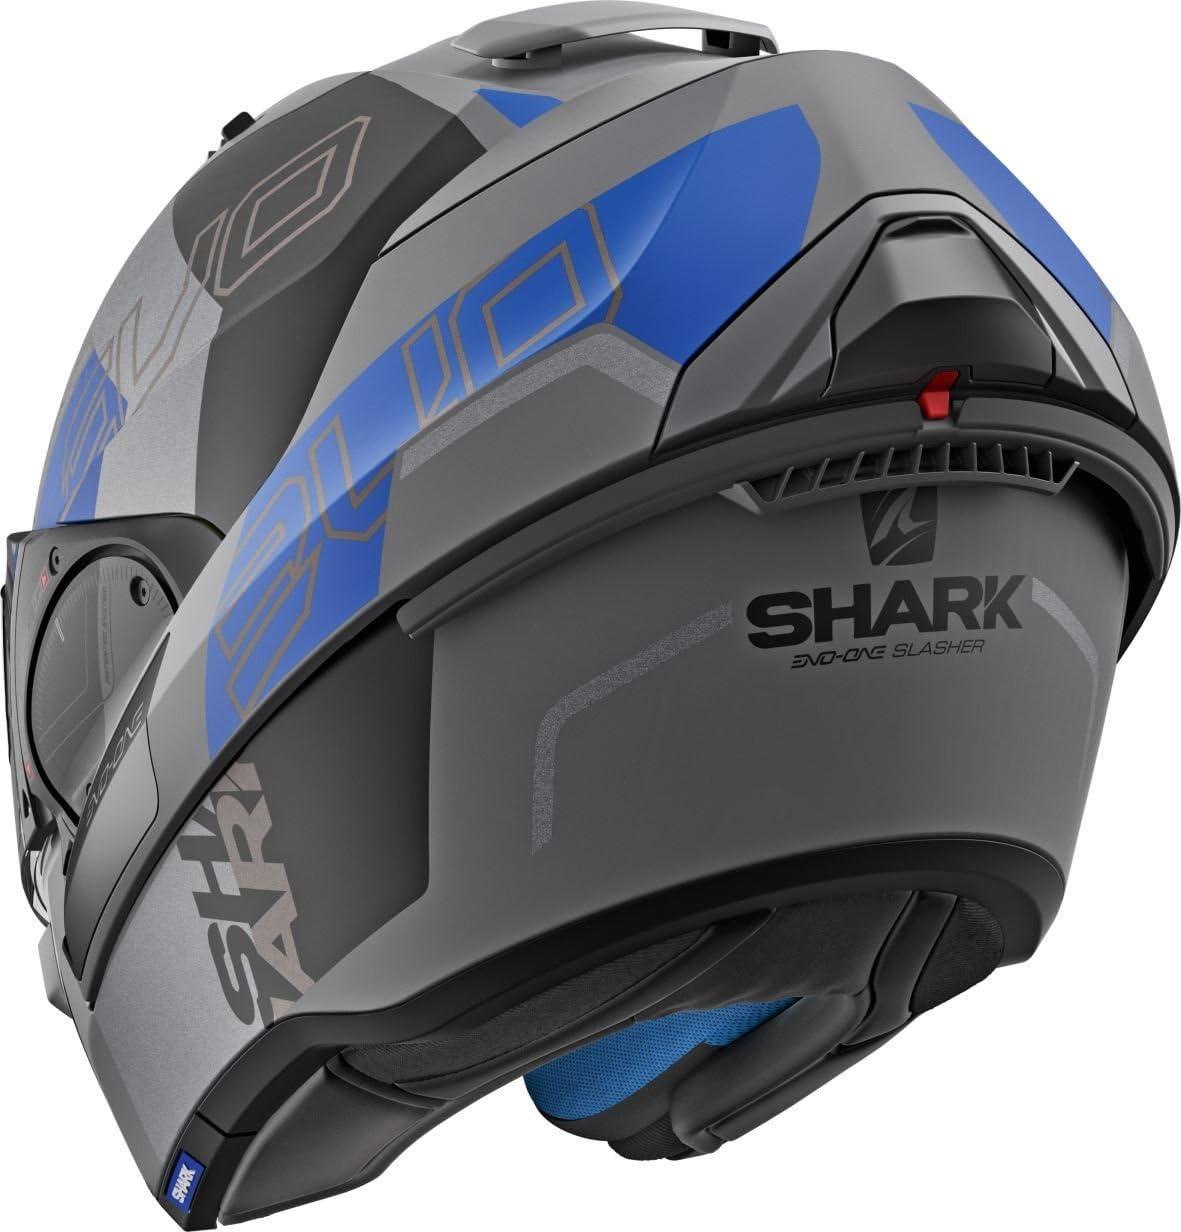 Anthracite//Blau Shark Motorradhelm EVO-ONE 2 SLASHER MAT AKB XS